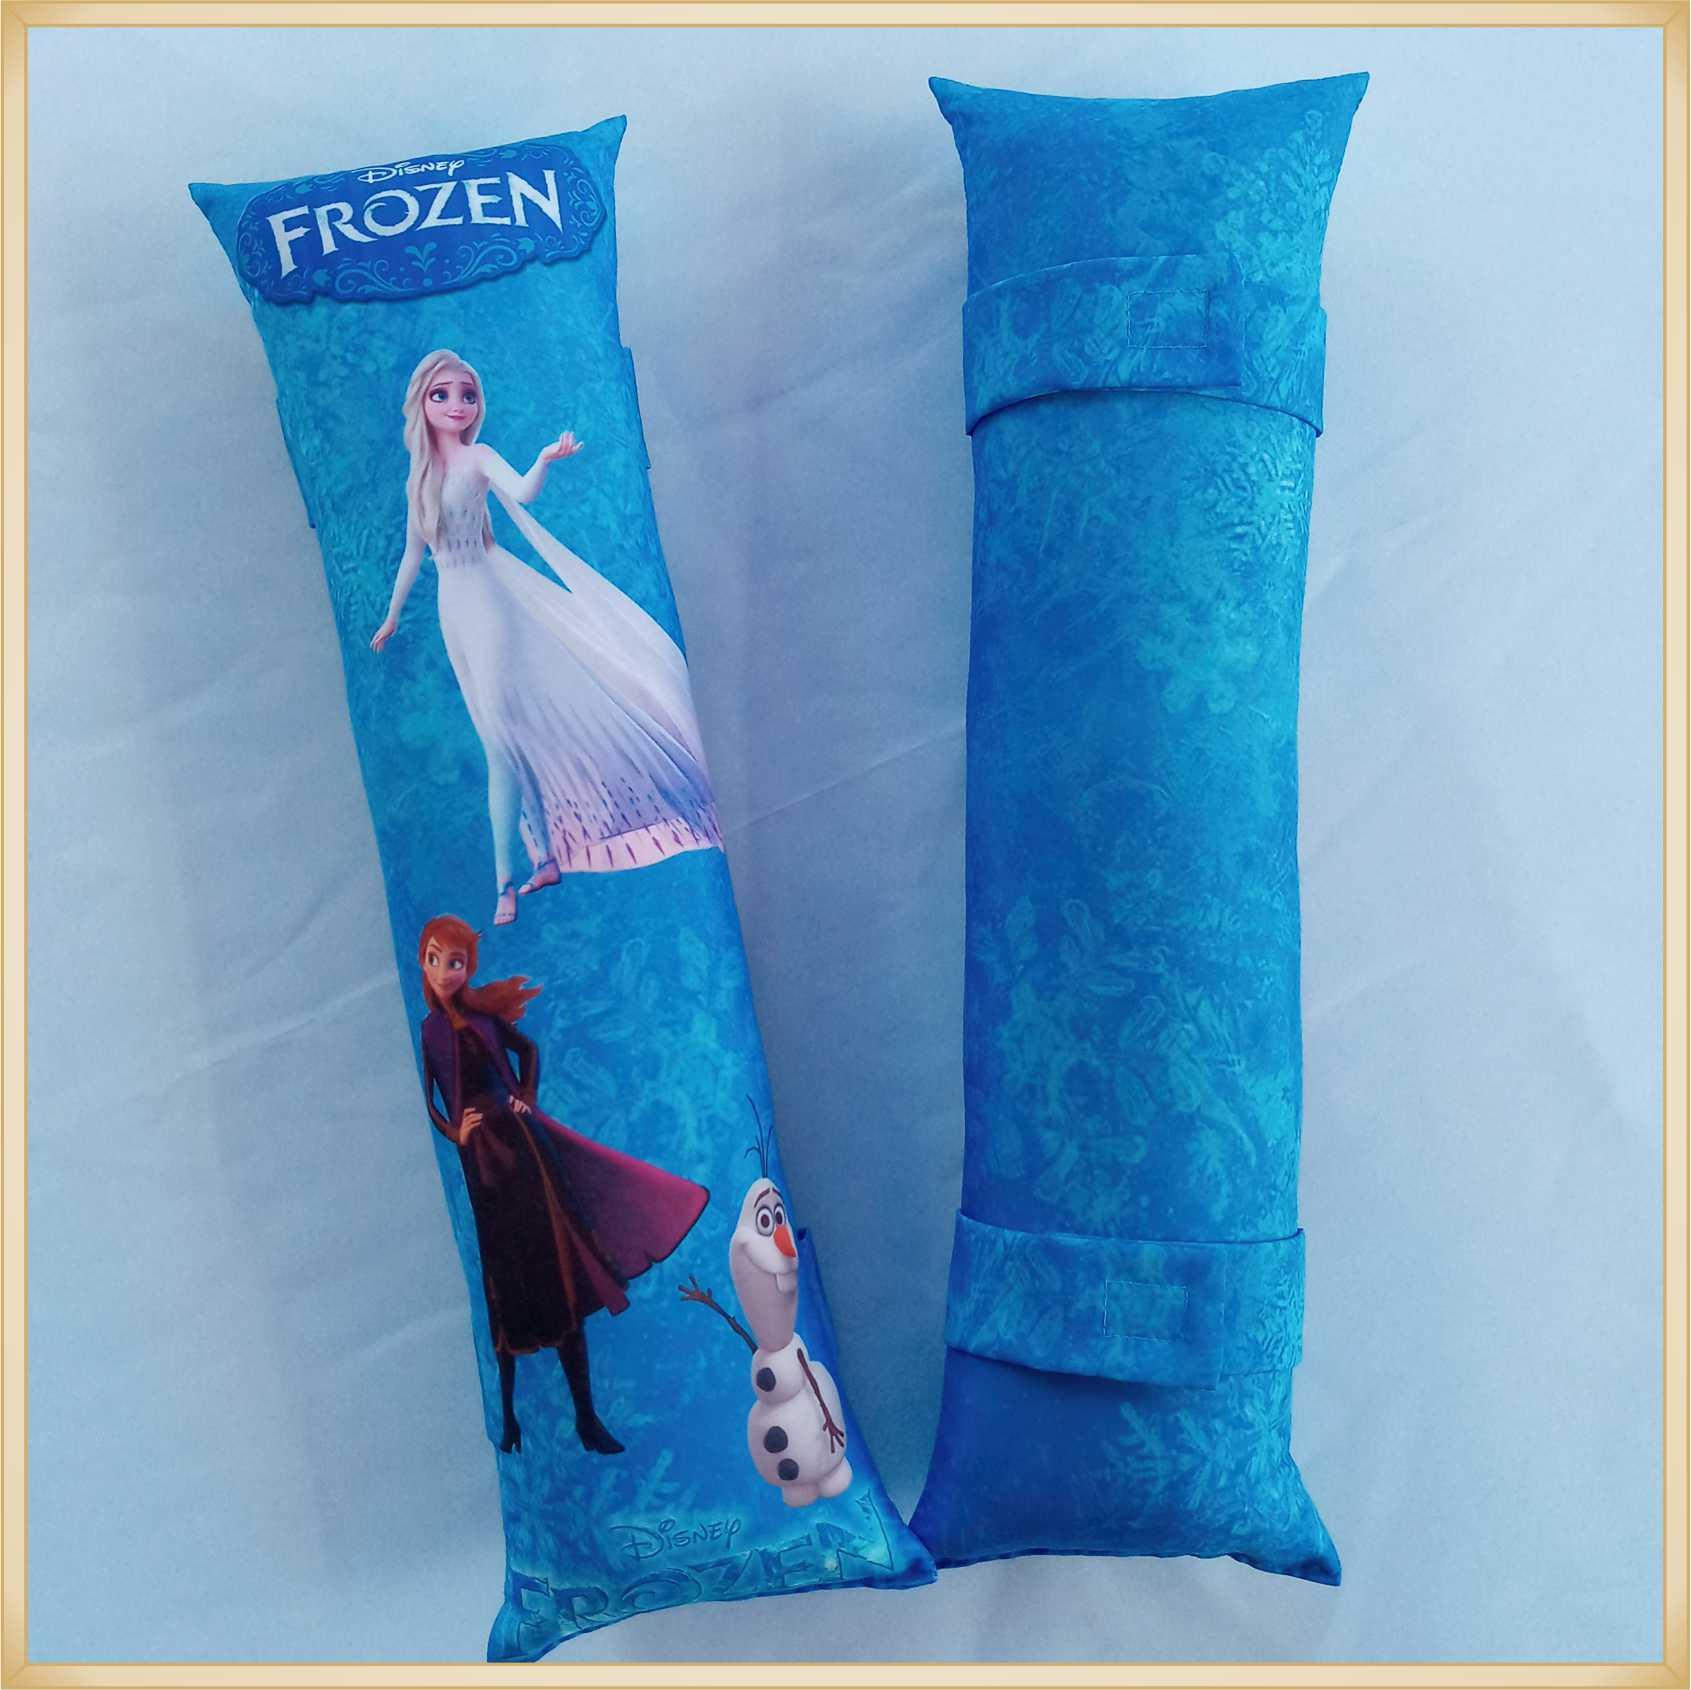 Almofada para Cinto de Segurança Personalizada - Frozen